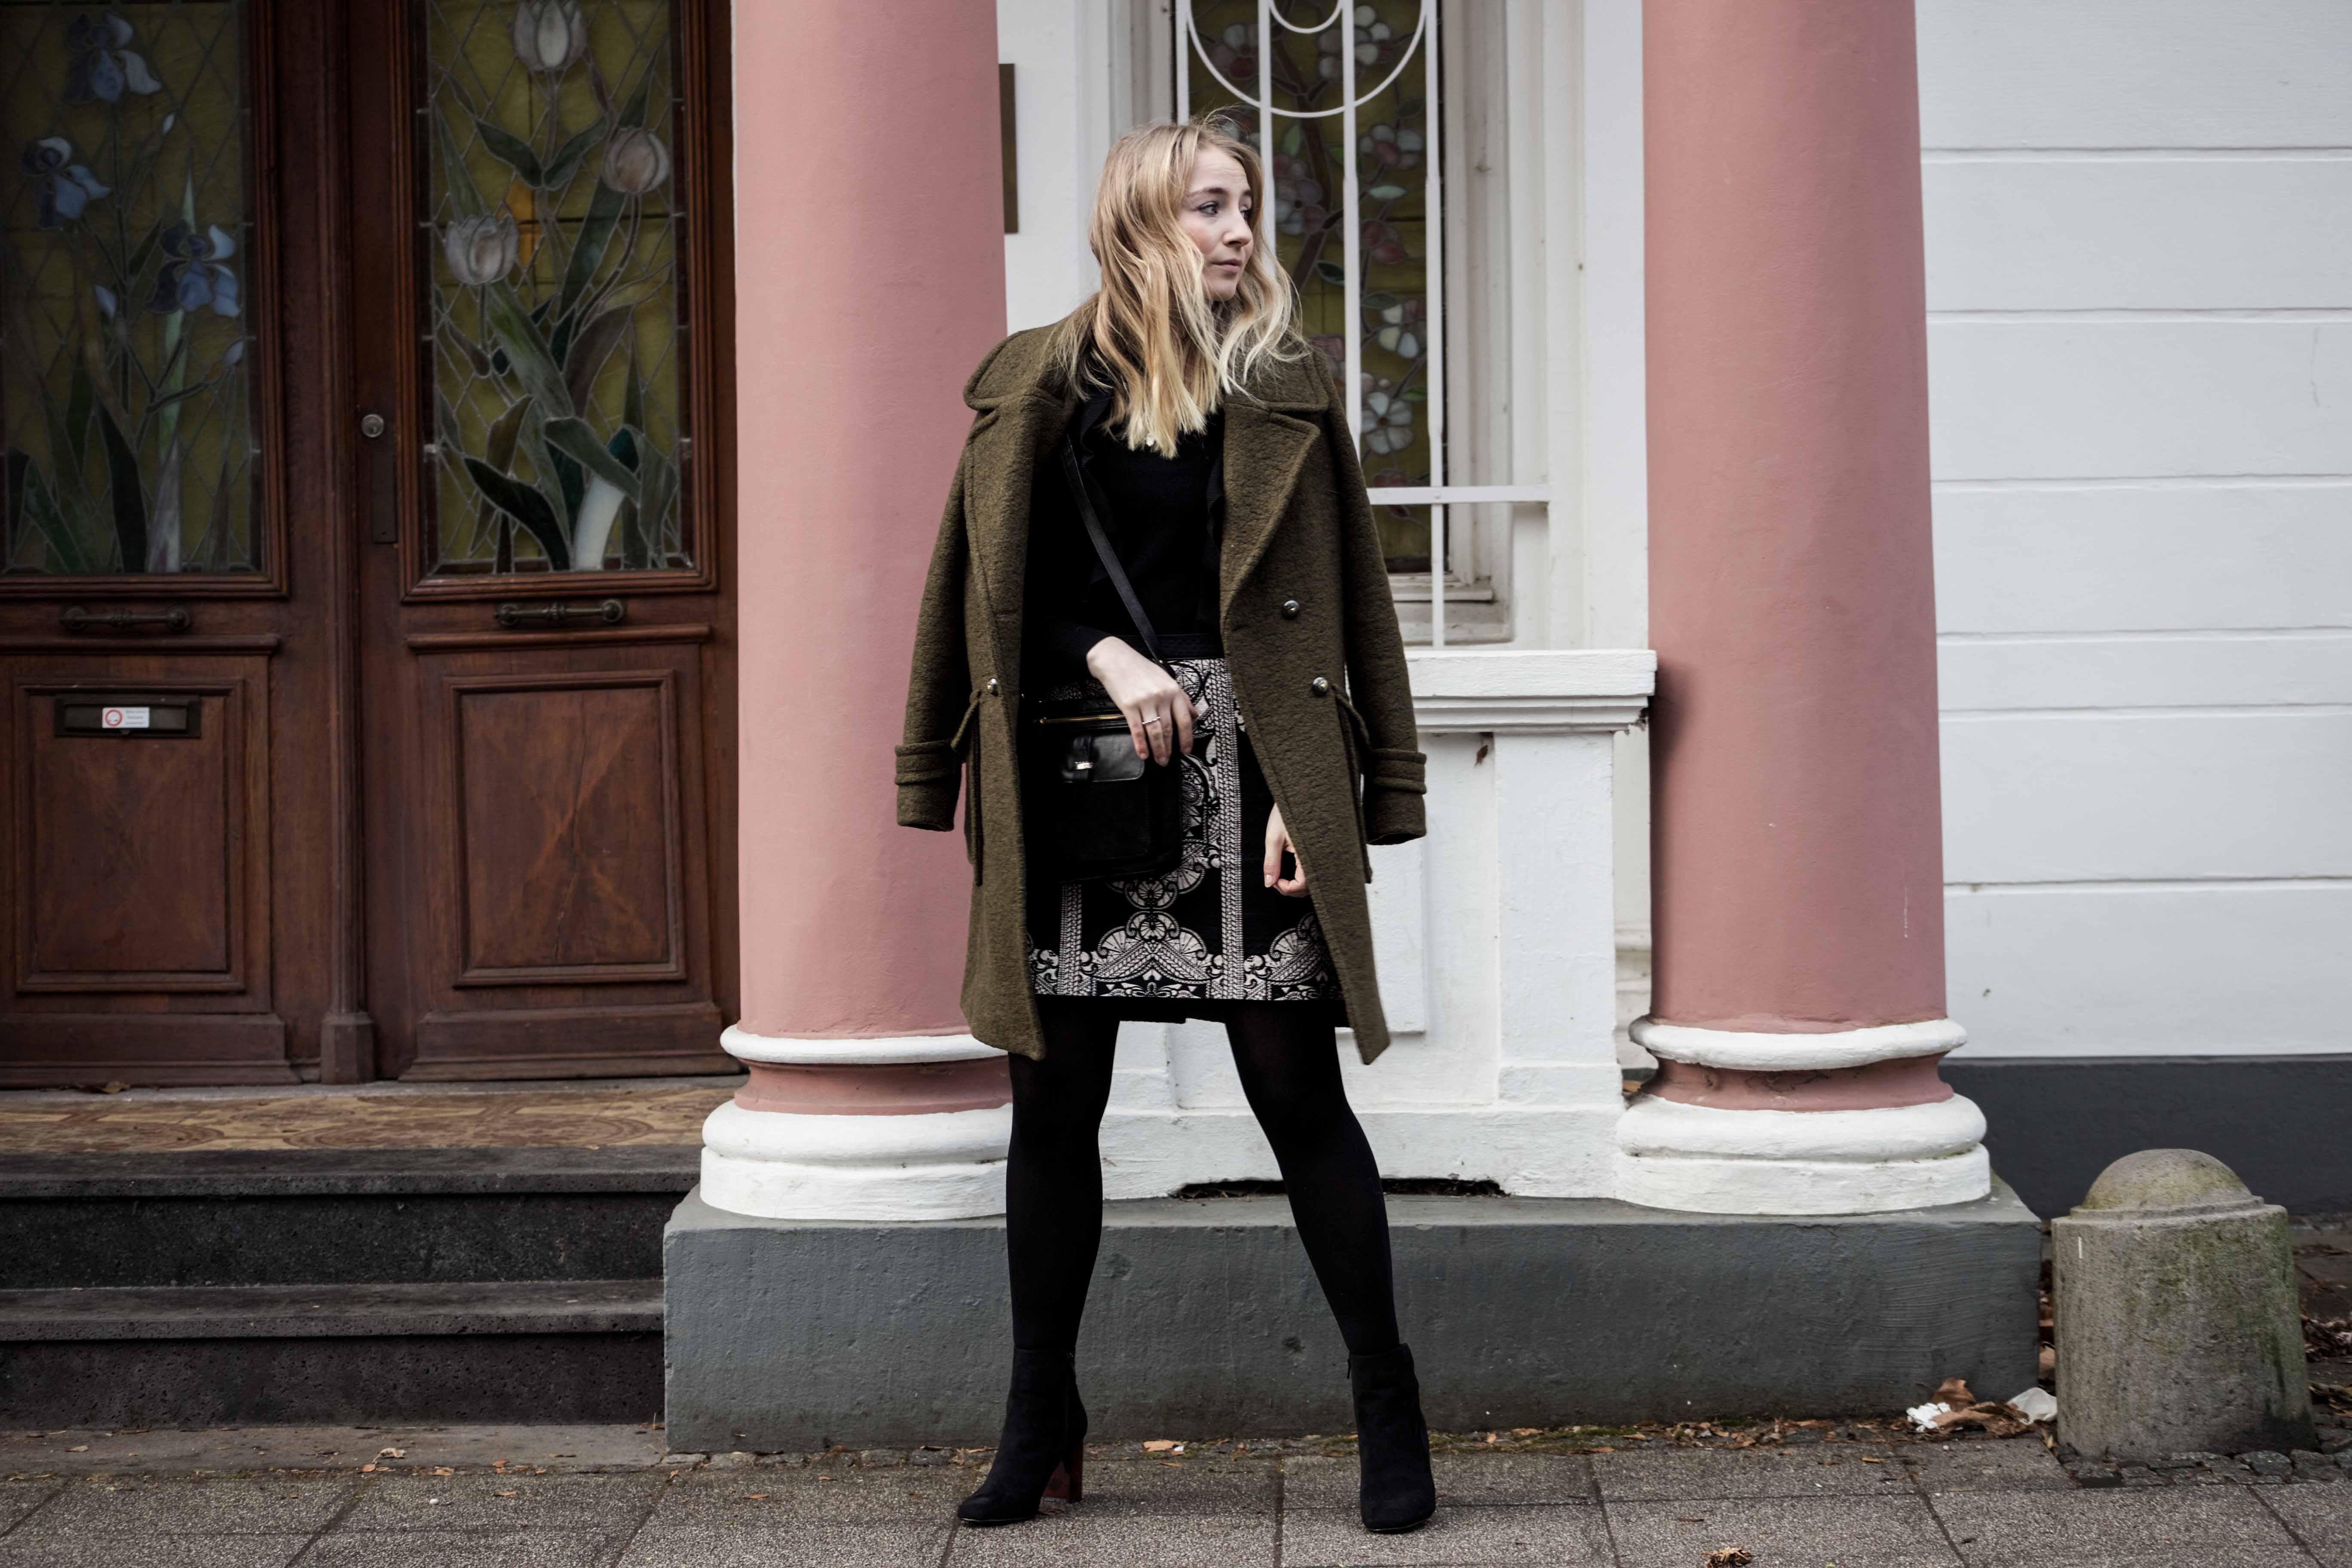 streetstyle-bonn-waldgrüner-mantel-rock-muster-print-fashionblogger-modeblog-mode-outfit_0098